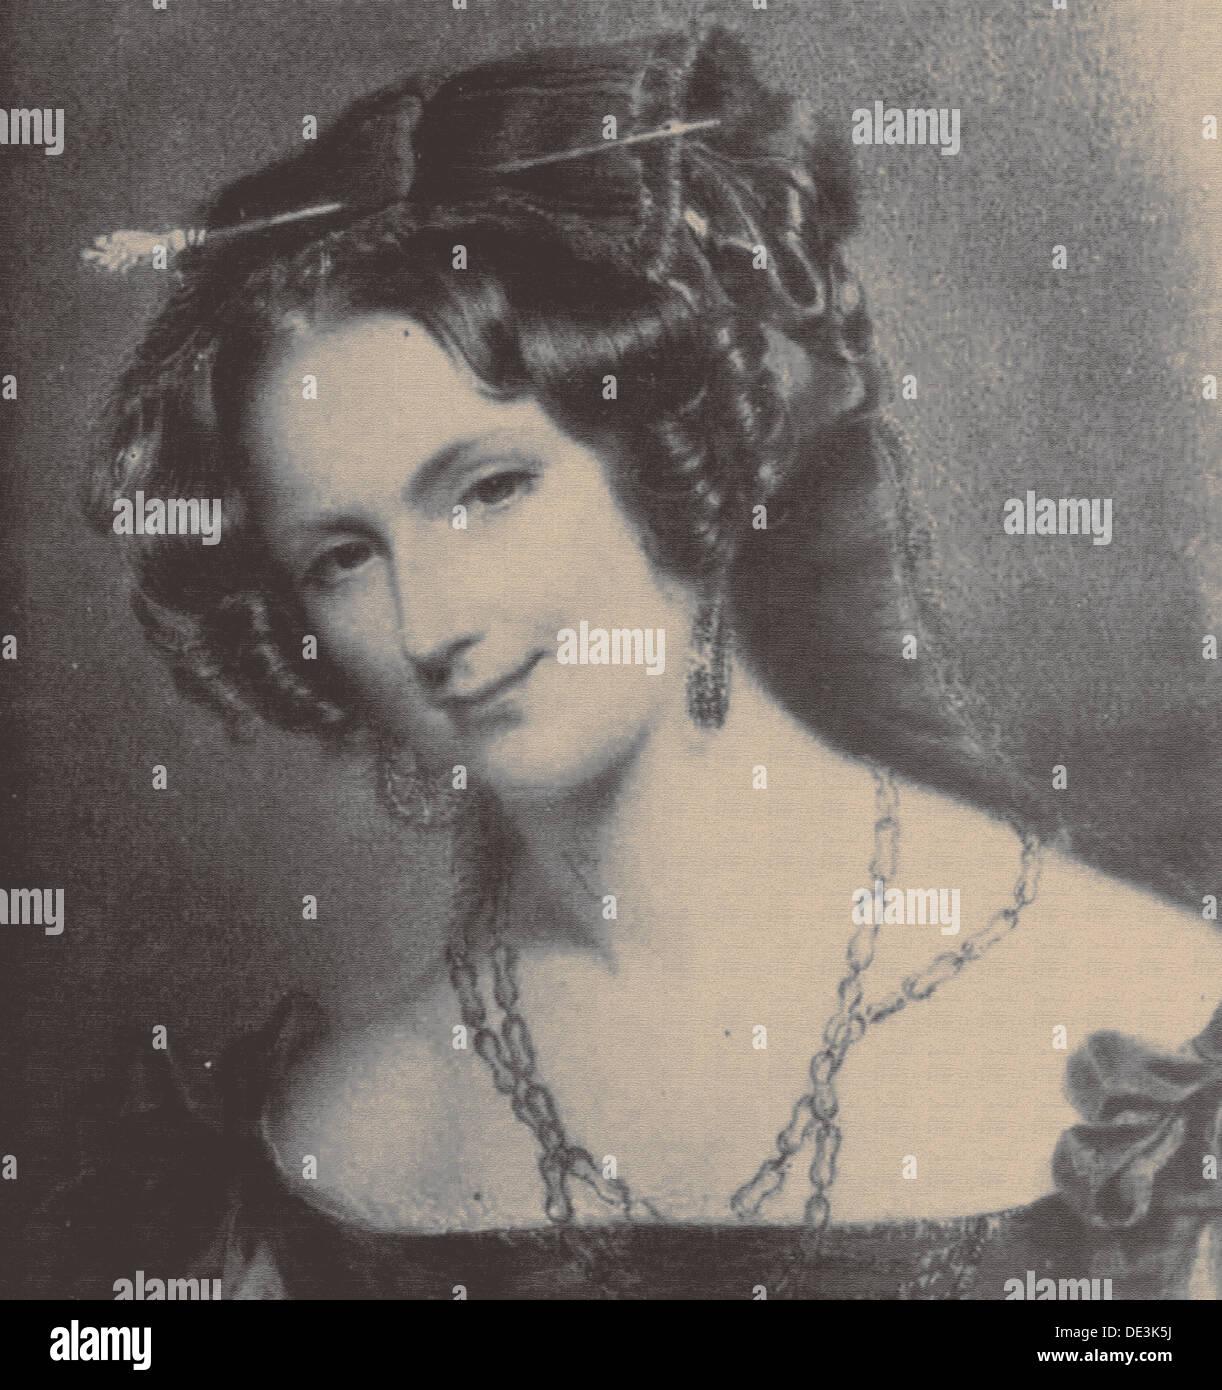 Portrait of Lady Catherine Caroline Montagu (1808-1834), wife of Count Alexandre Joseph Colonna-Walewski, 1830s. Artist: Anonymo - Stock Image